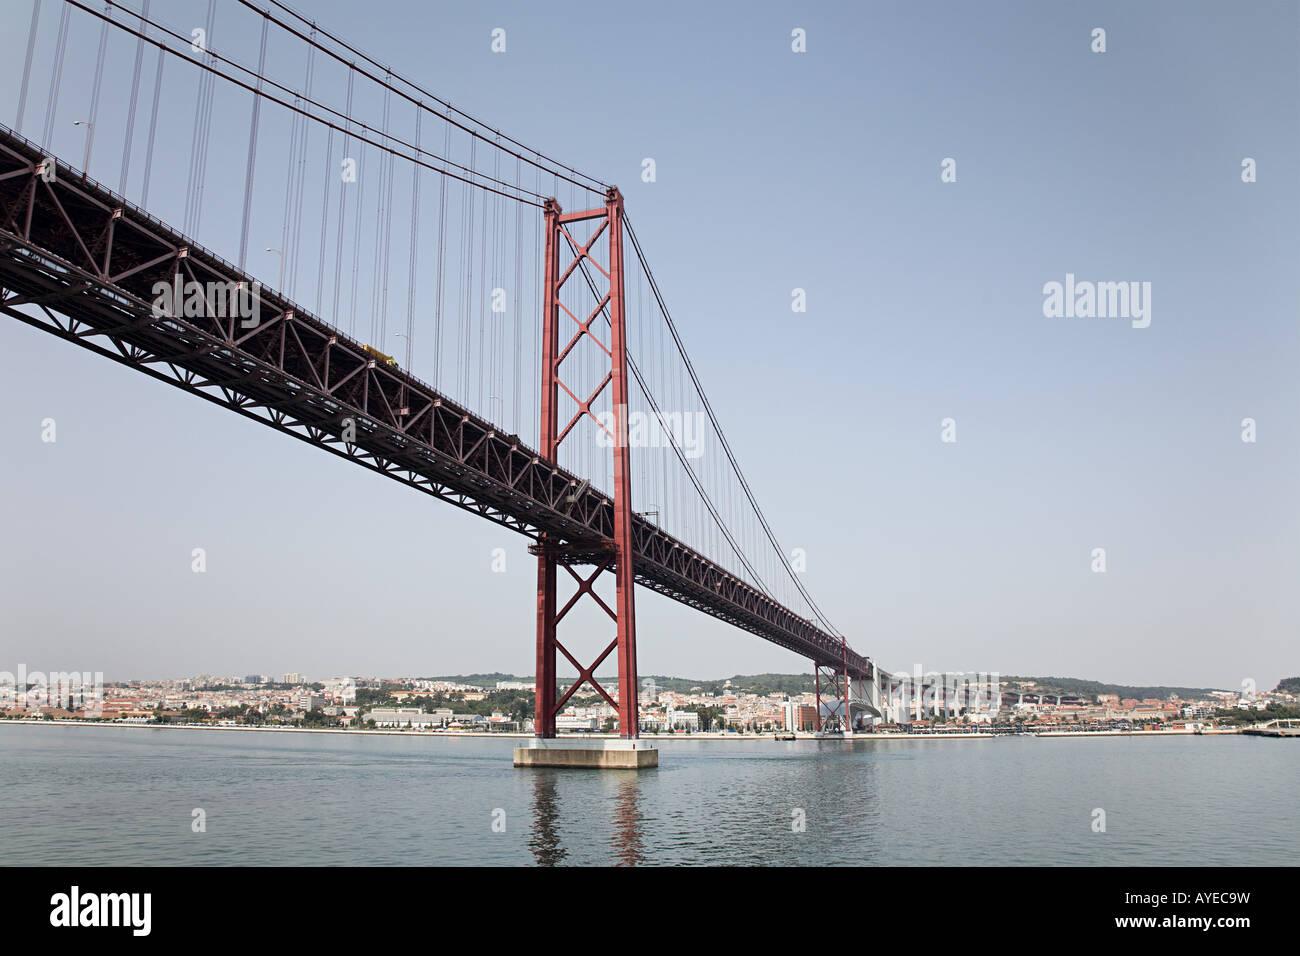 Vasco de gama bridge lisbon portugal - Stock Image